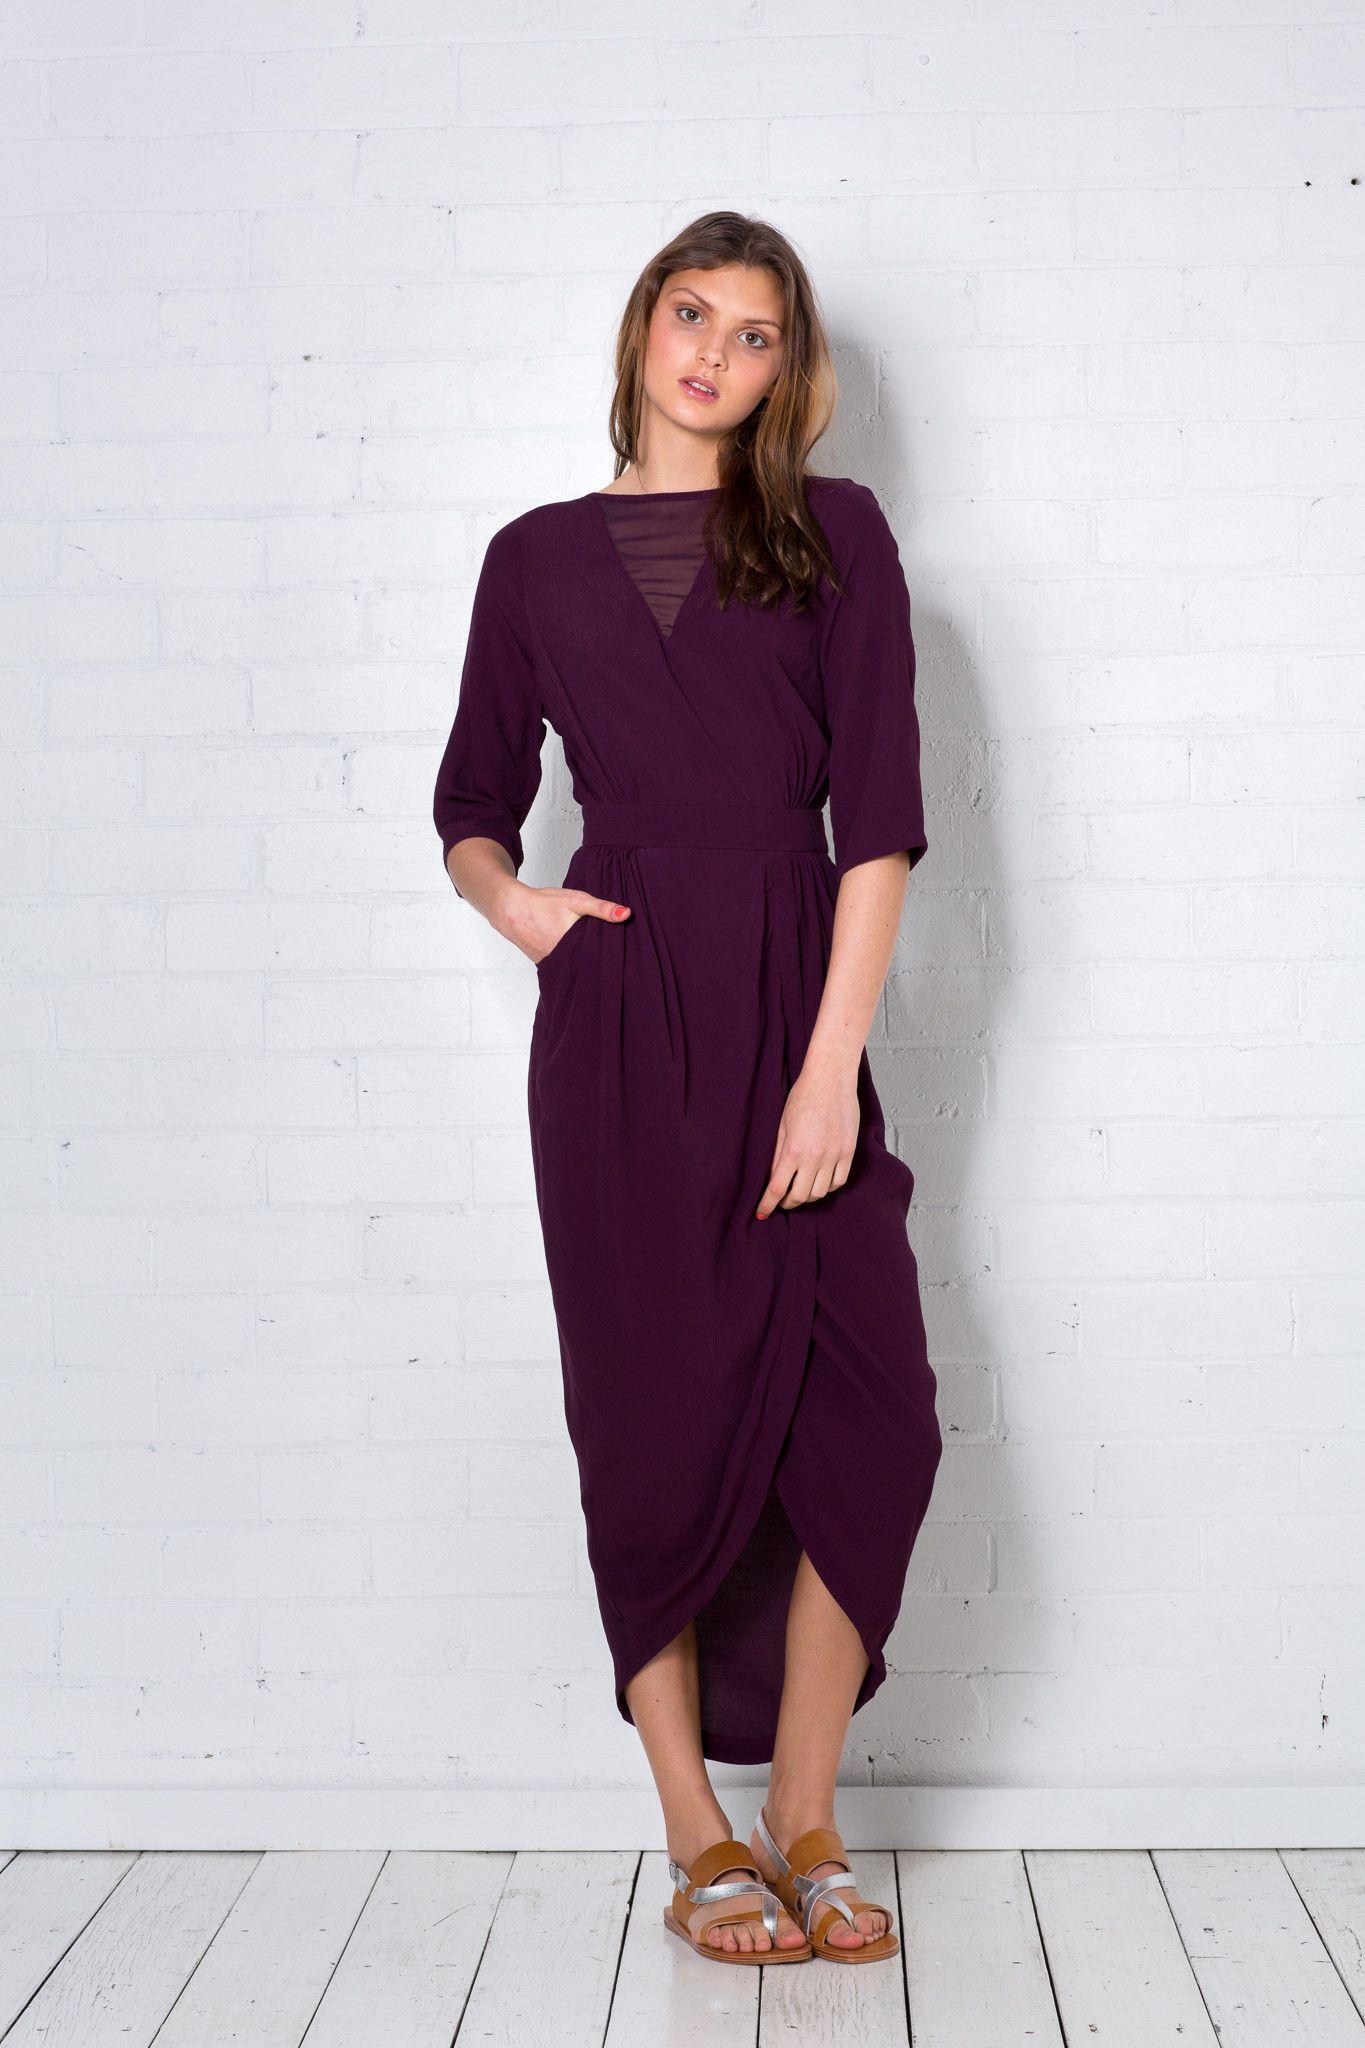 Planner Dress 3/4 Sleeve | Personal style | Pinterest